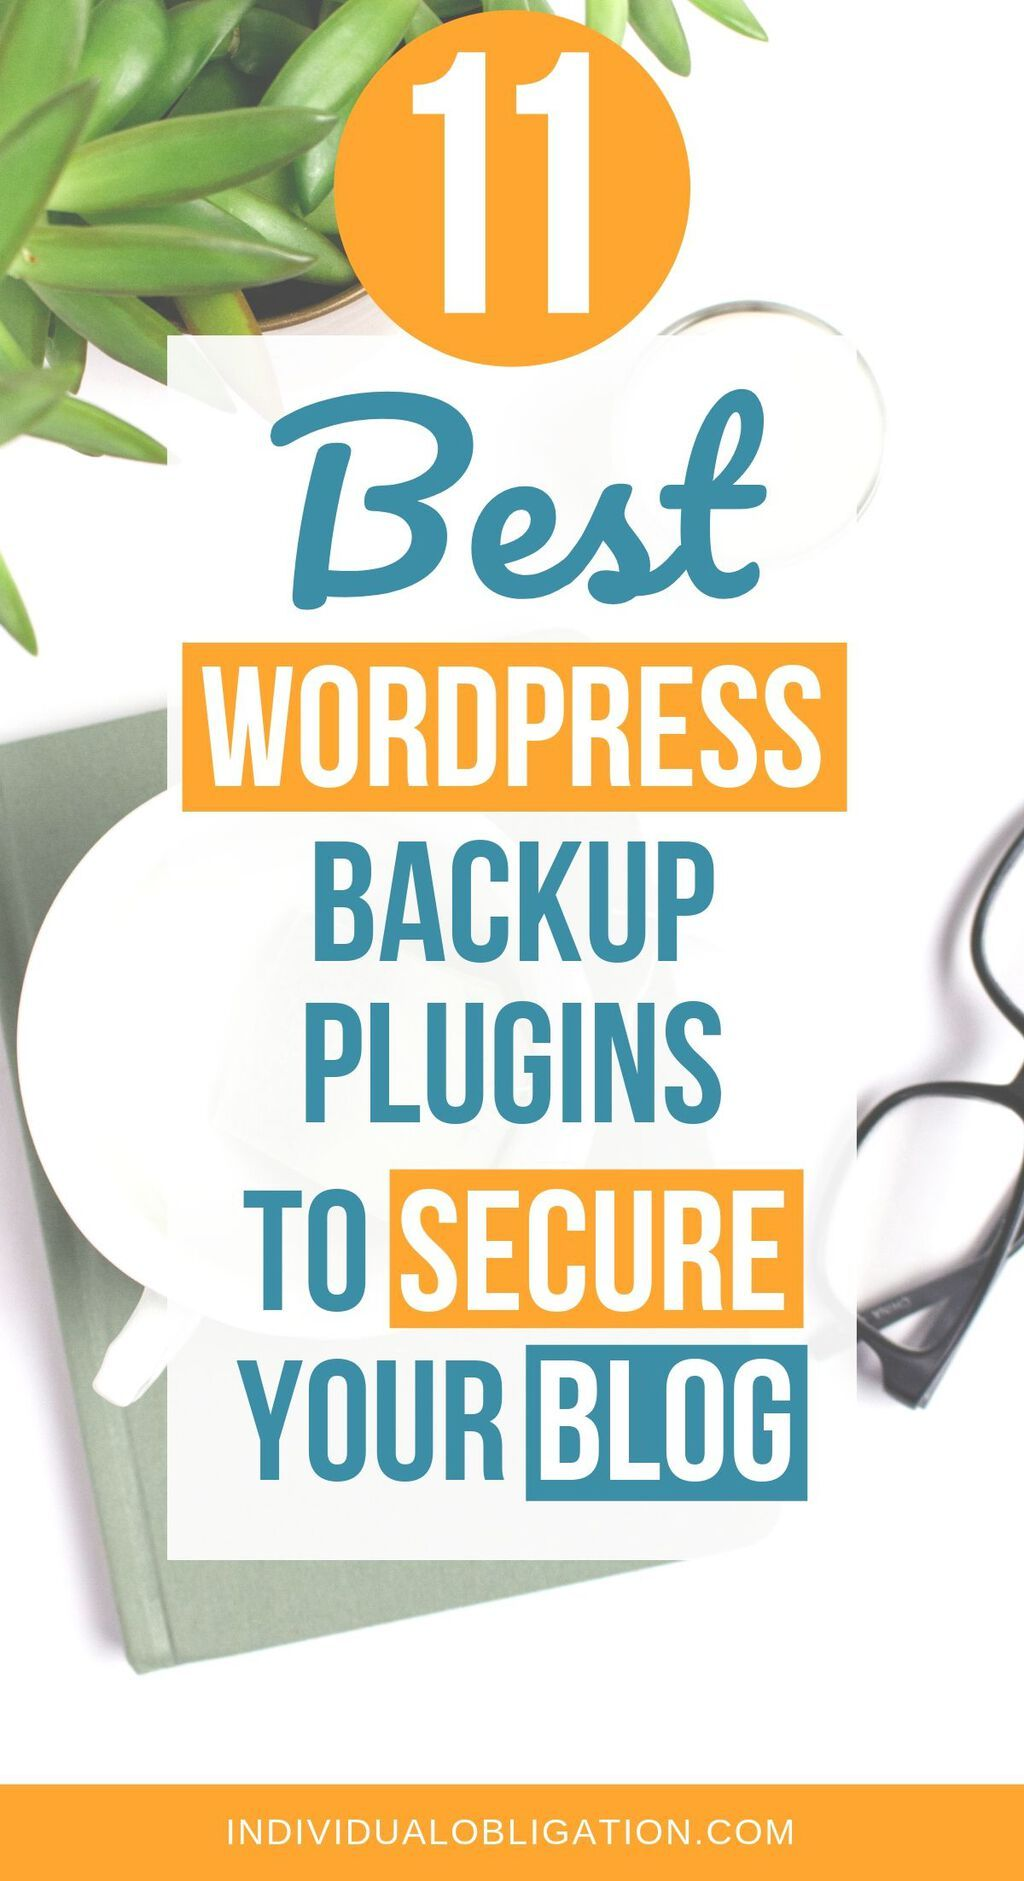 Top 11 Popular WordPress Backup Plugin Tools For Your